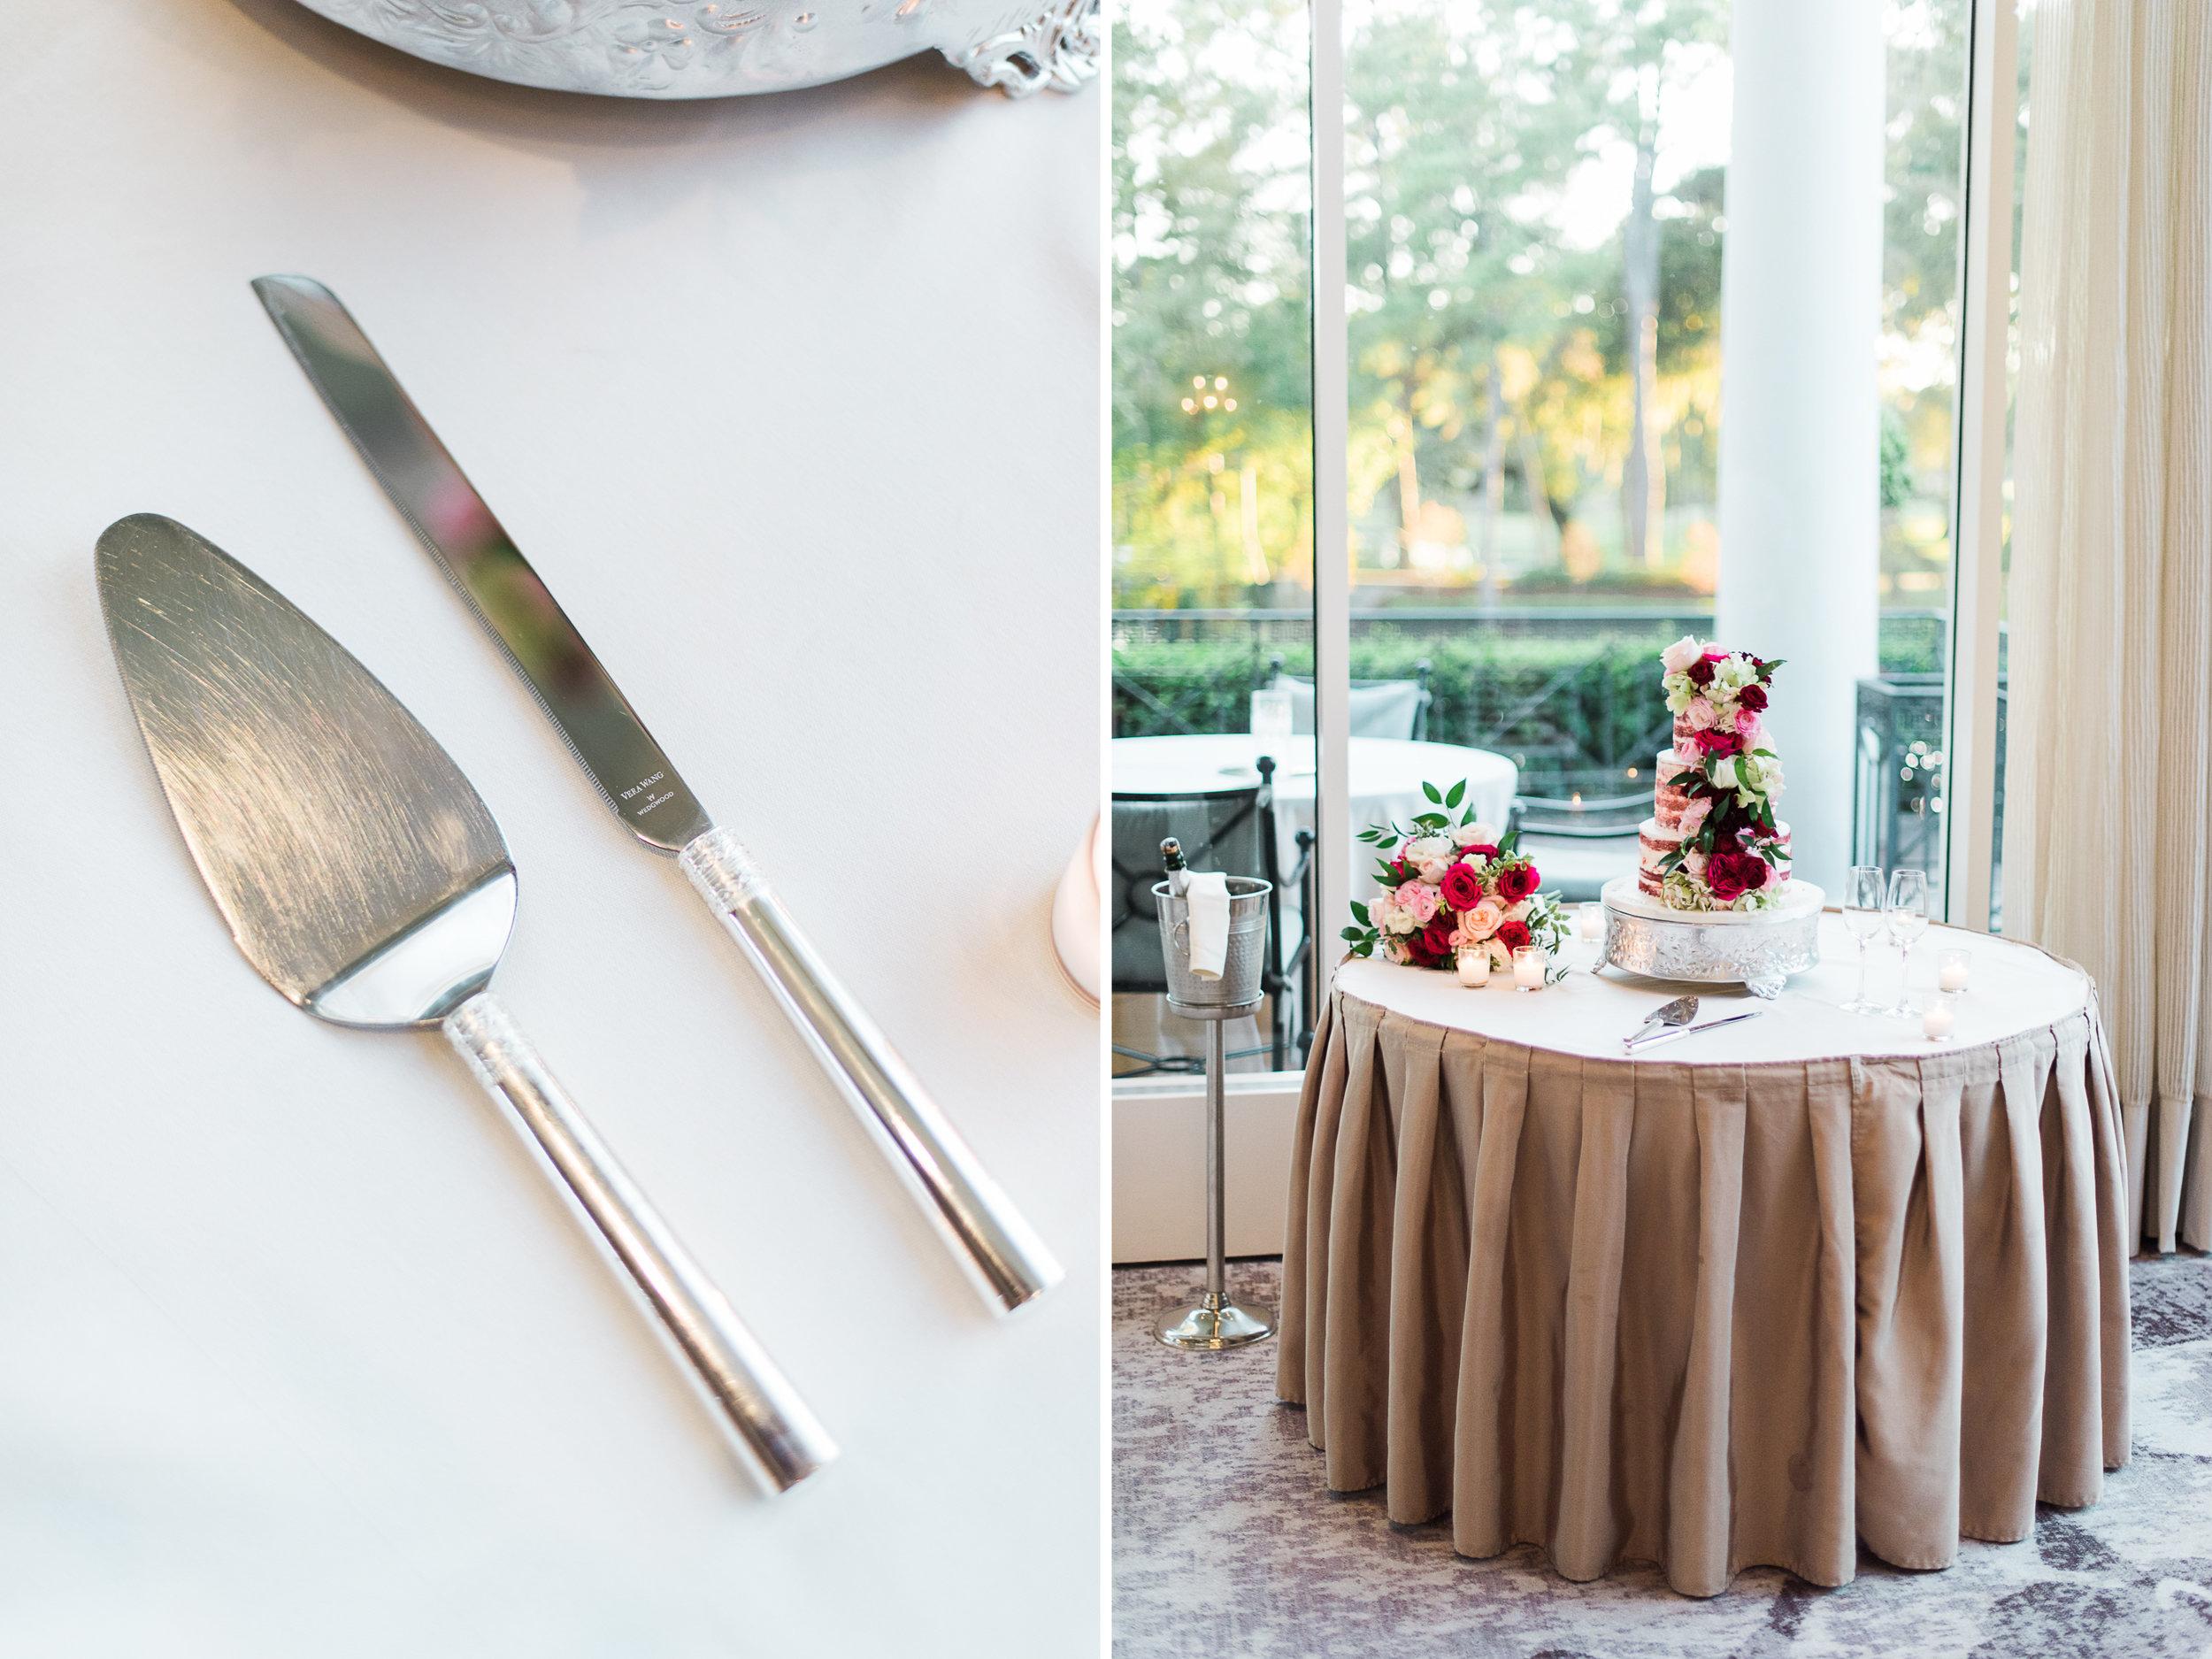 Houston-Wedding-Photographer-Lakeside-Country-Club-First-Look-Bride-Groom-Formals-Film-Fine-Art-Photography-121.jpg